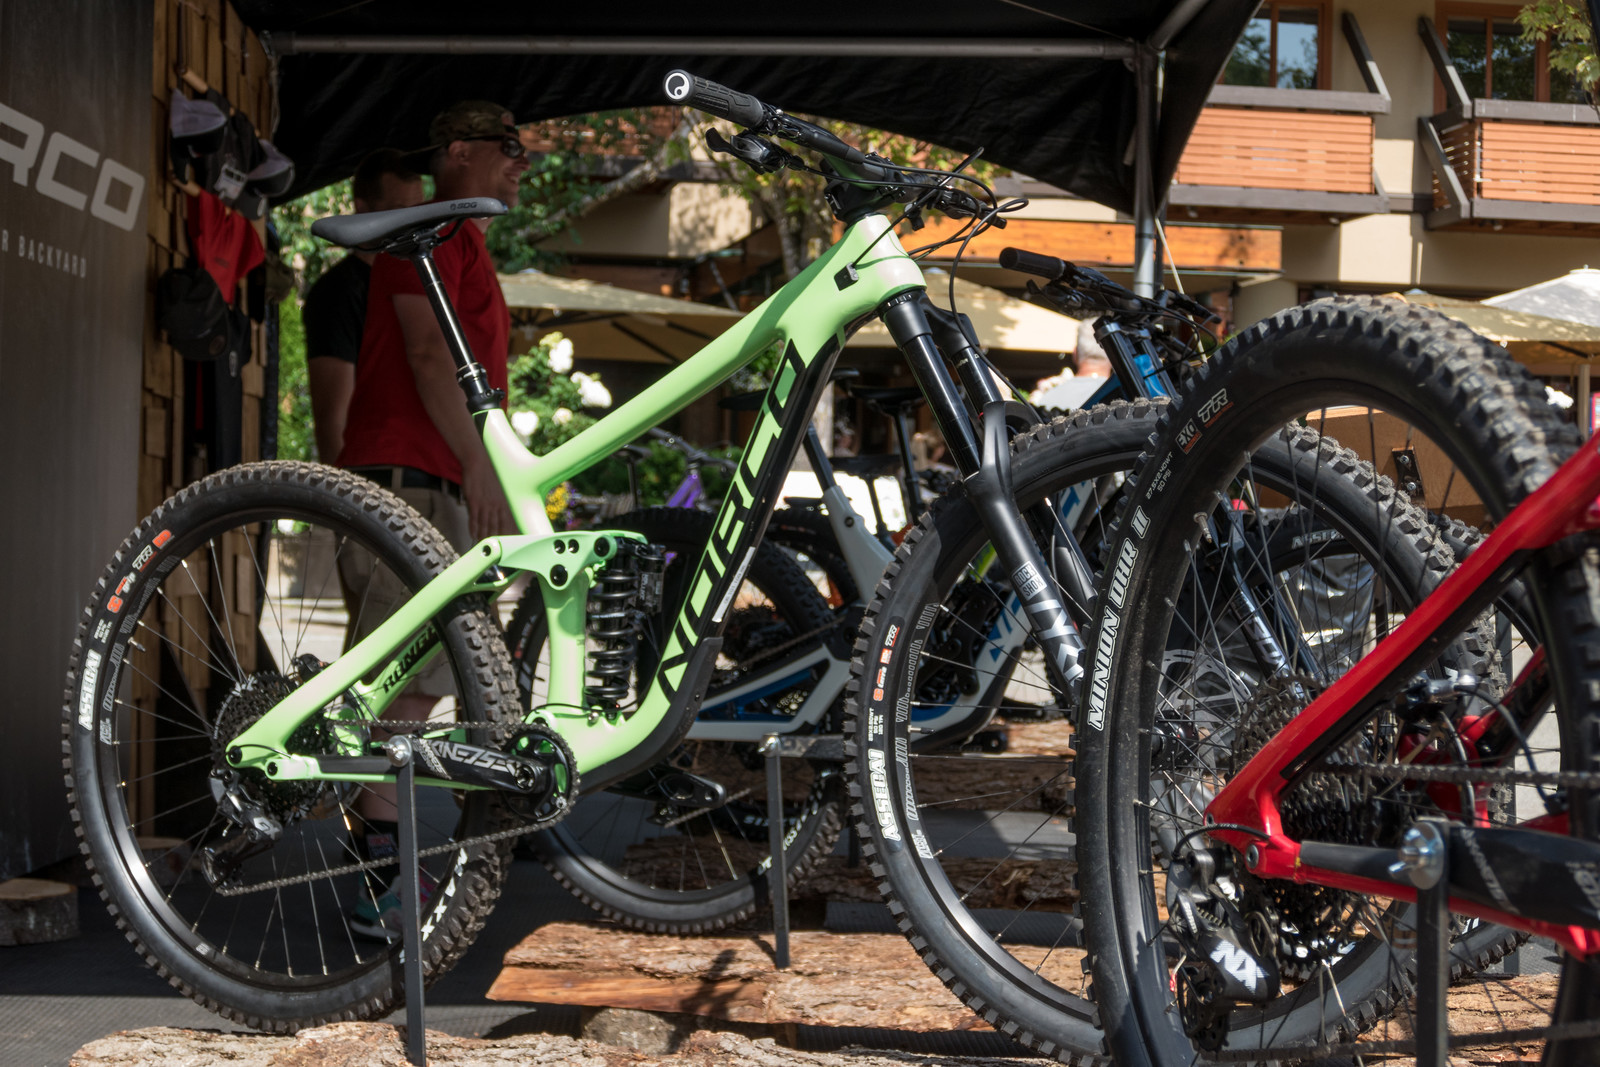 2020 Norco Range Carbon and Aurum Carbon HSP - PIT BITS - 2019 Crankworx Whistler Bikes and Tech - Mountain Biking Pictures - Vital MTB